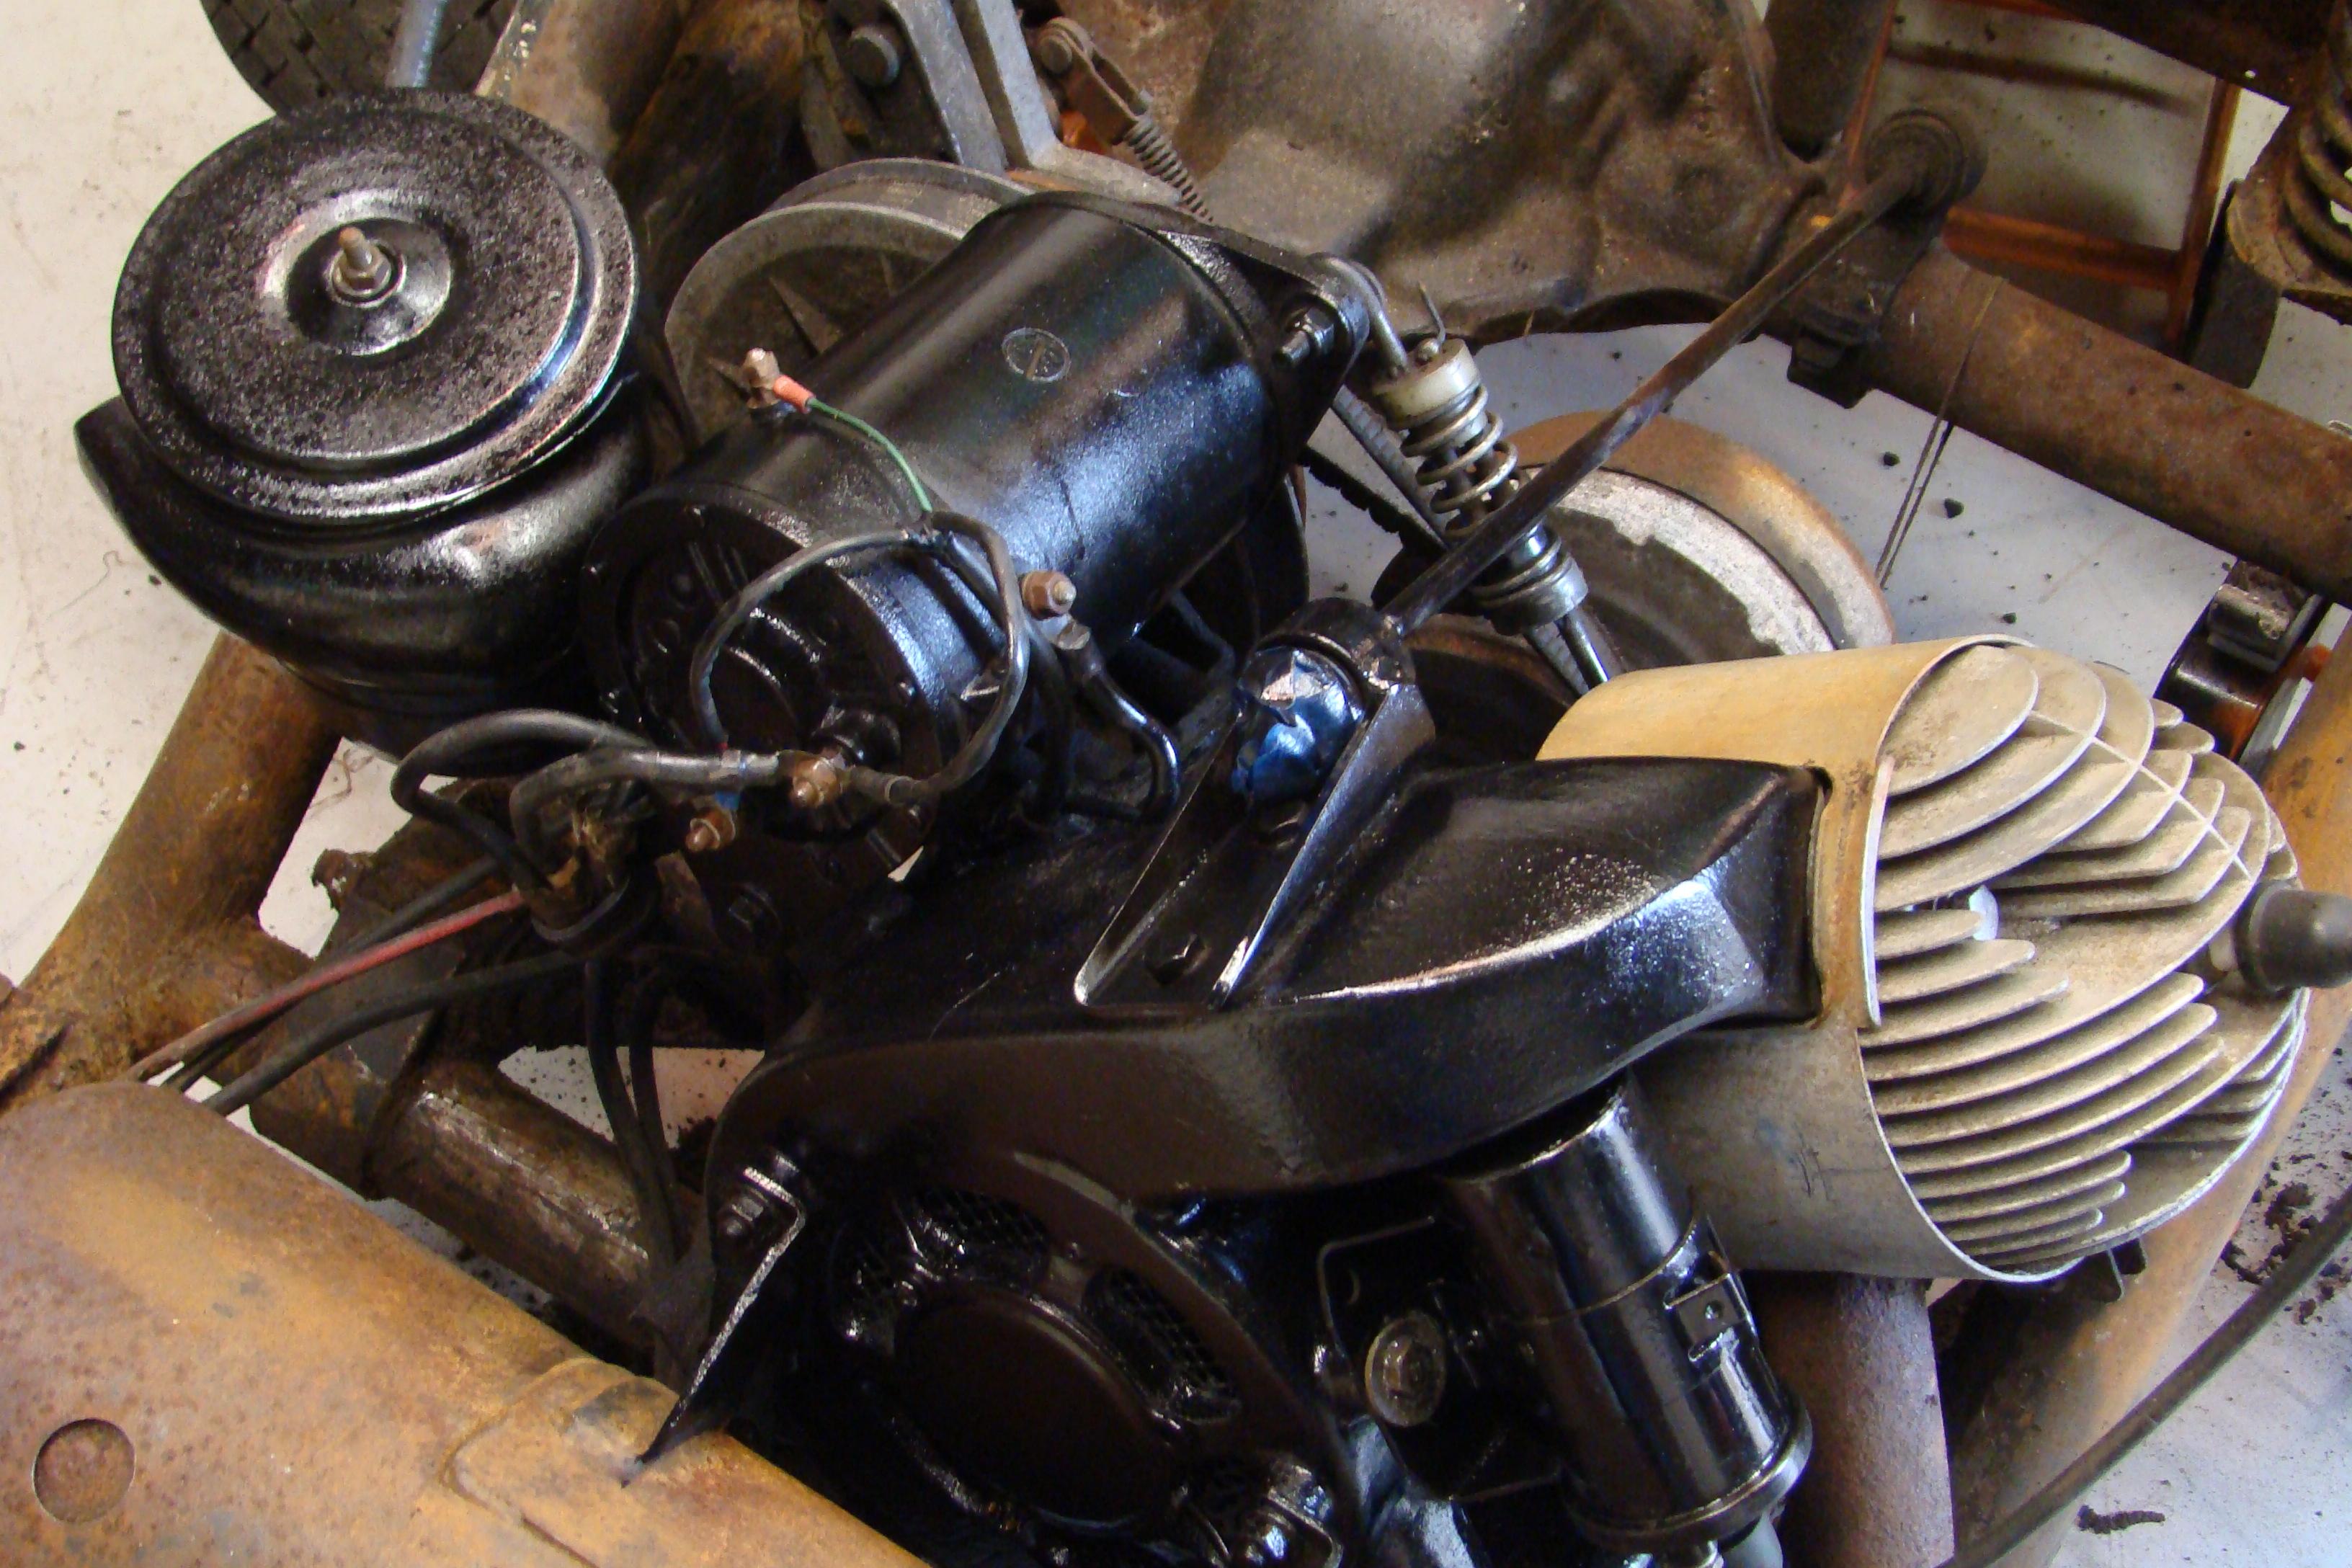 Harley Davidson Remote Starter Diagram - infiniti remote ... on